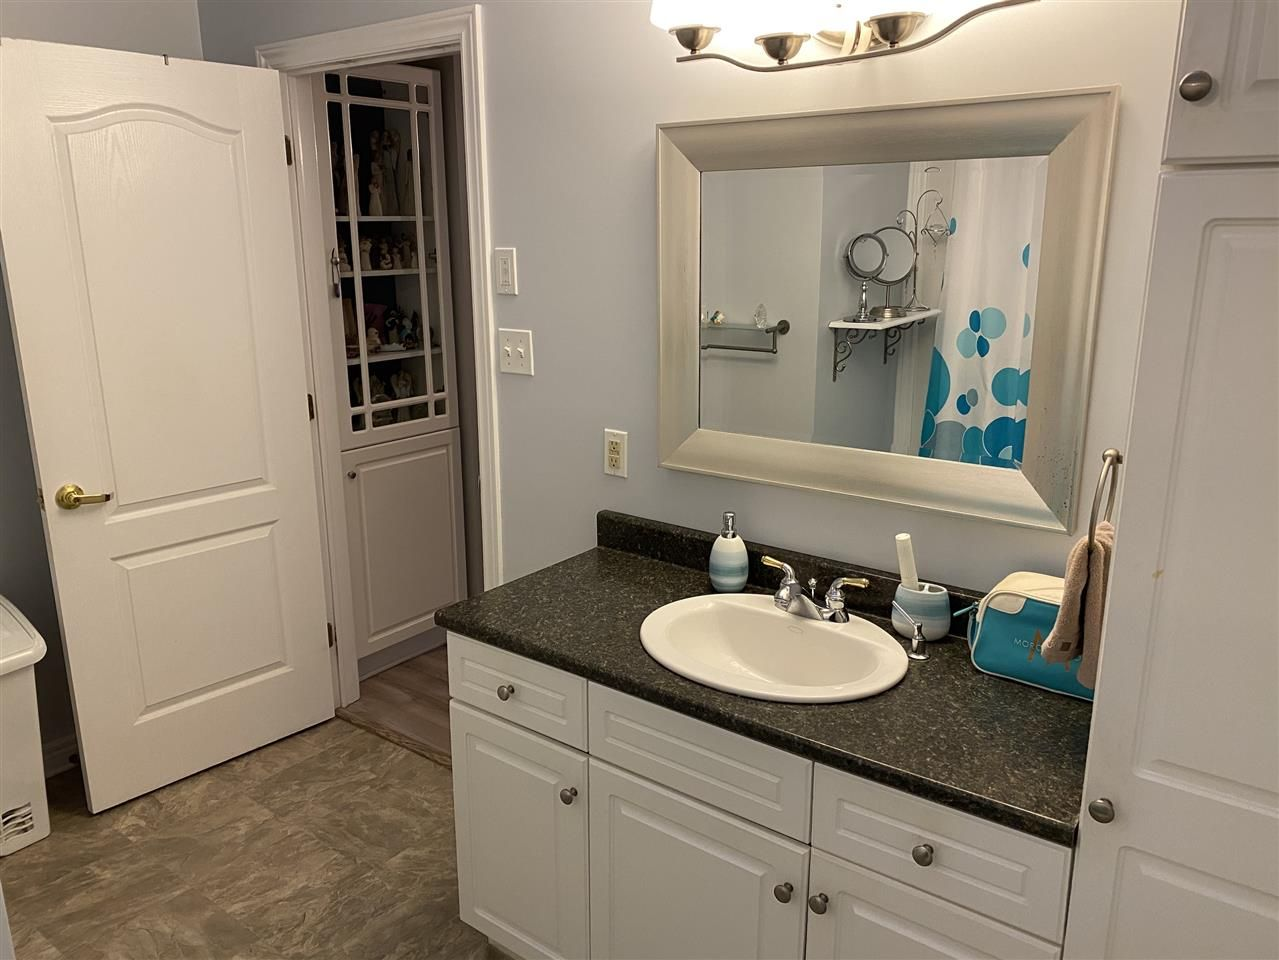 Photo 8: Photos: 7327 Main Street in Louisbourg: 206-Louisbourg Residential for sale (Cape Breton)  : MLS®# 202025505